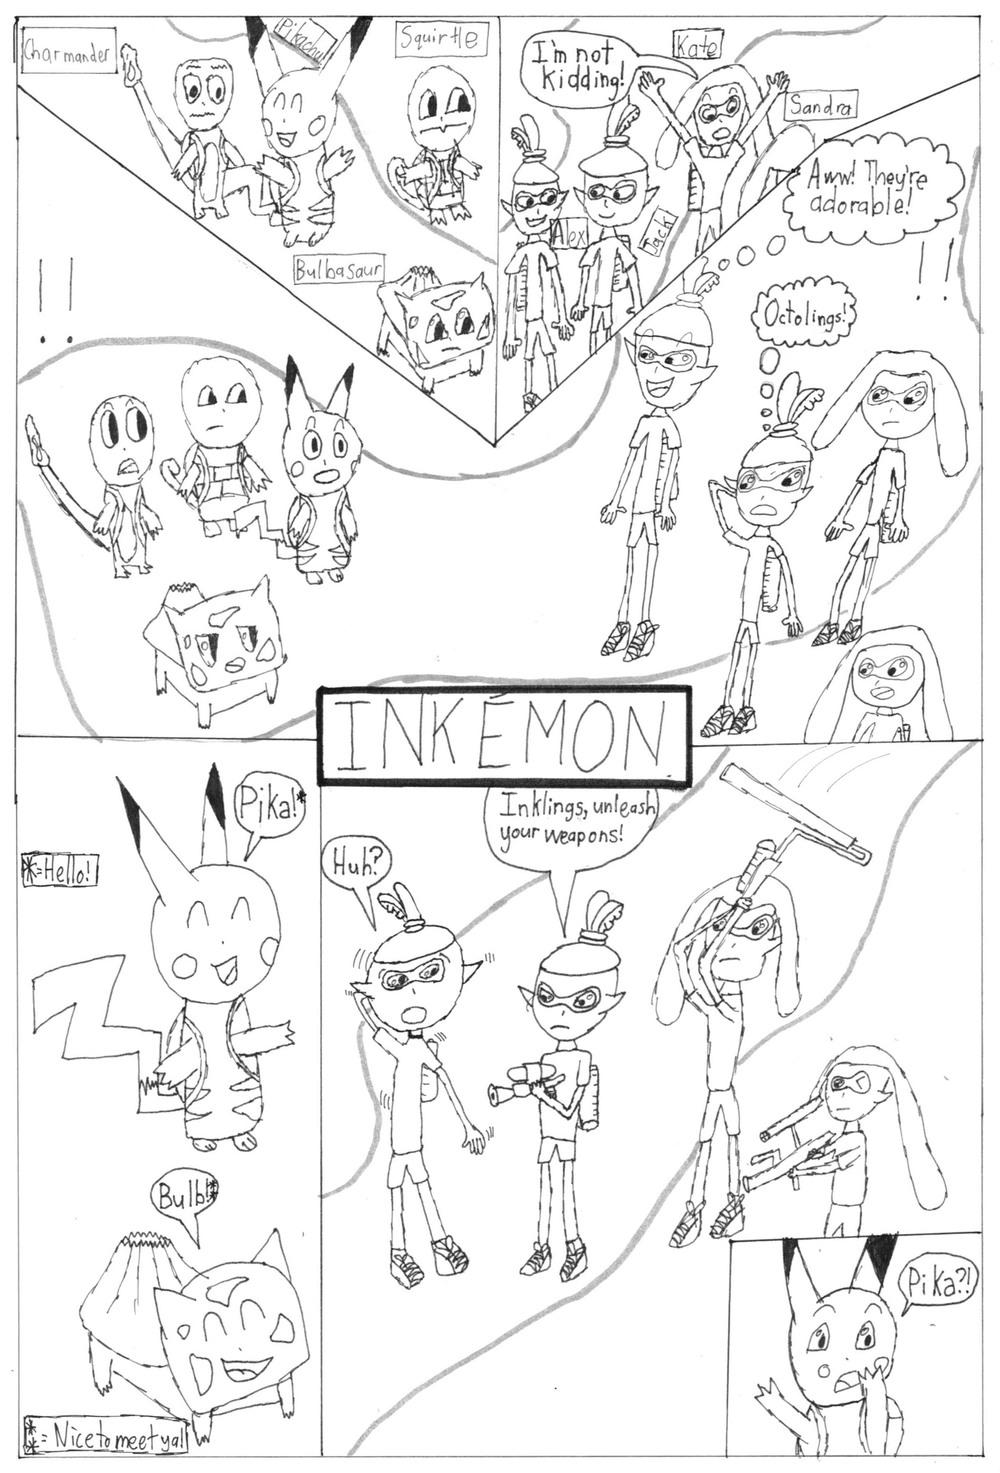 Michael Rosanelli Inkemon inksc.jpeg.jpg